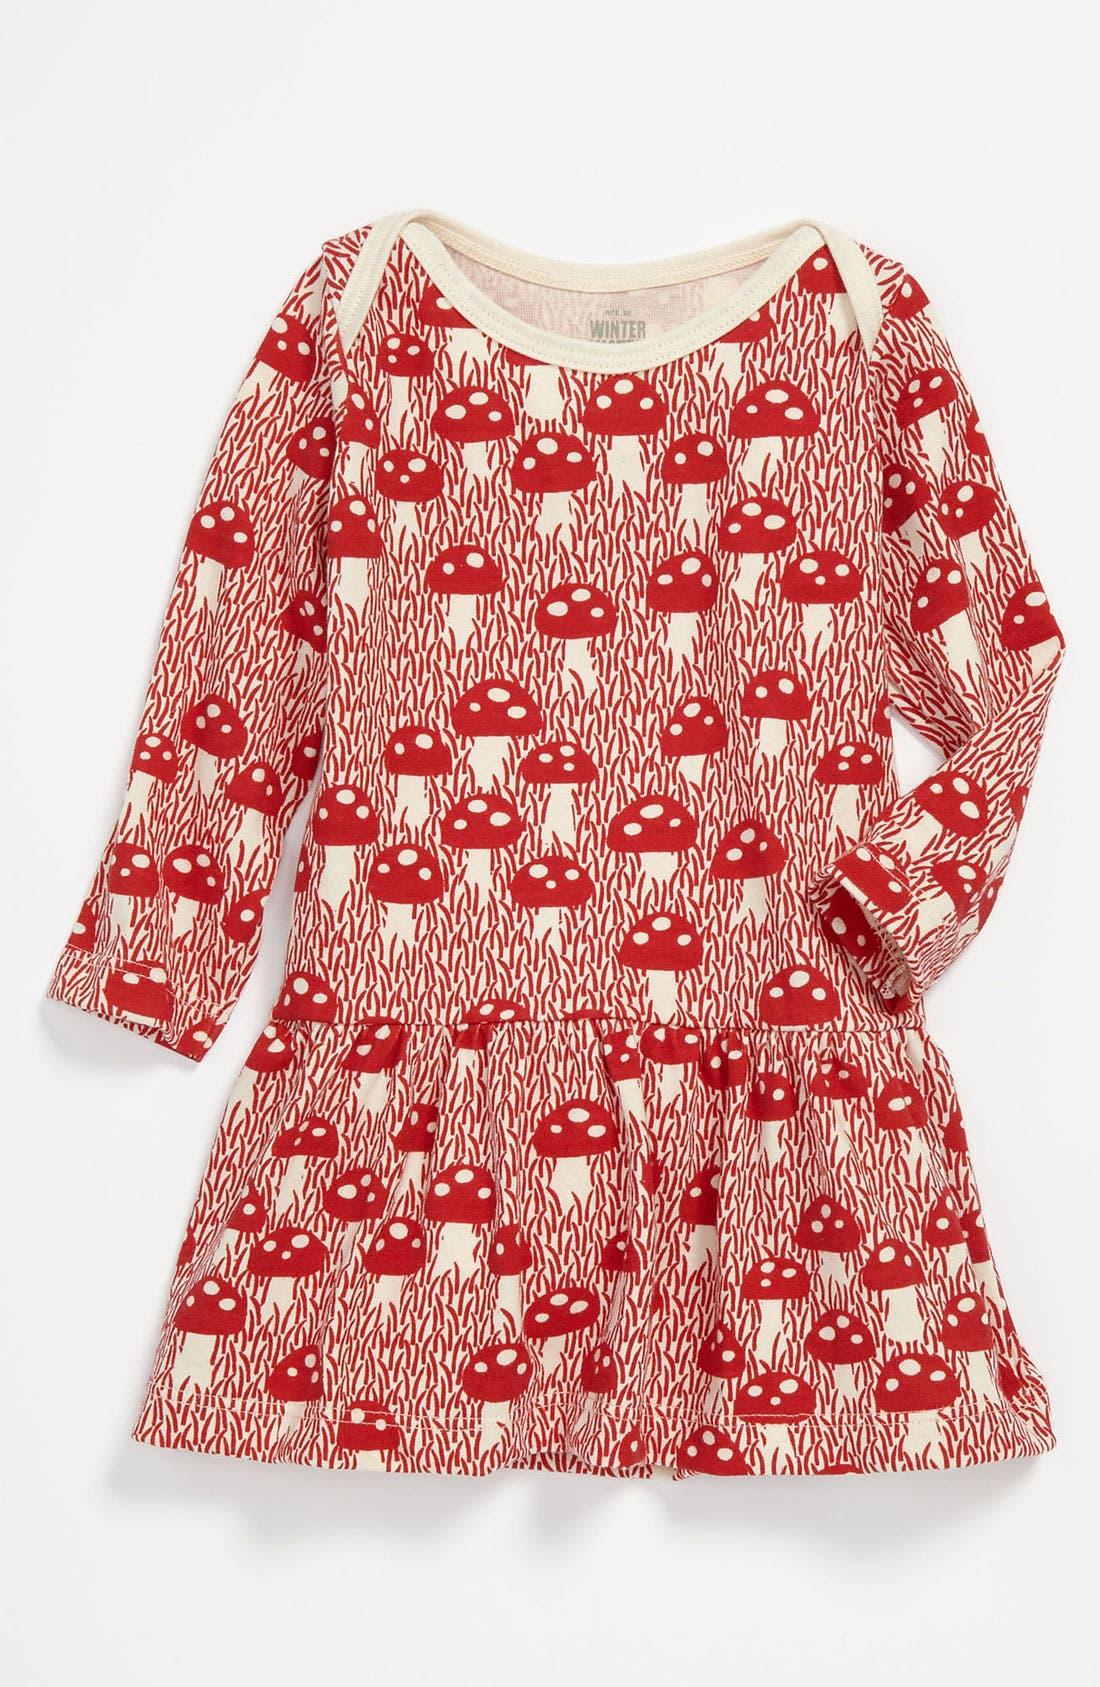 Alternate Image 1 Selected - Winter Water Factory 'Luna' Dress (Infant)